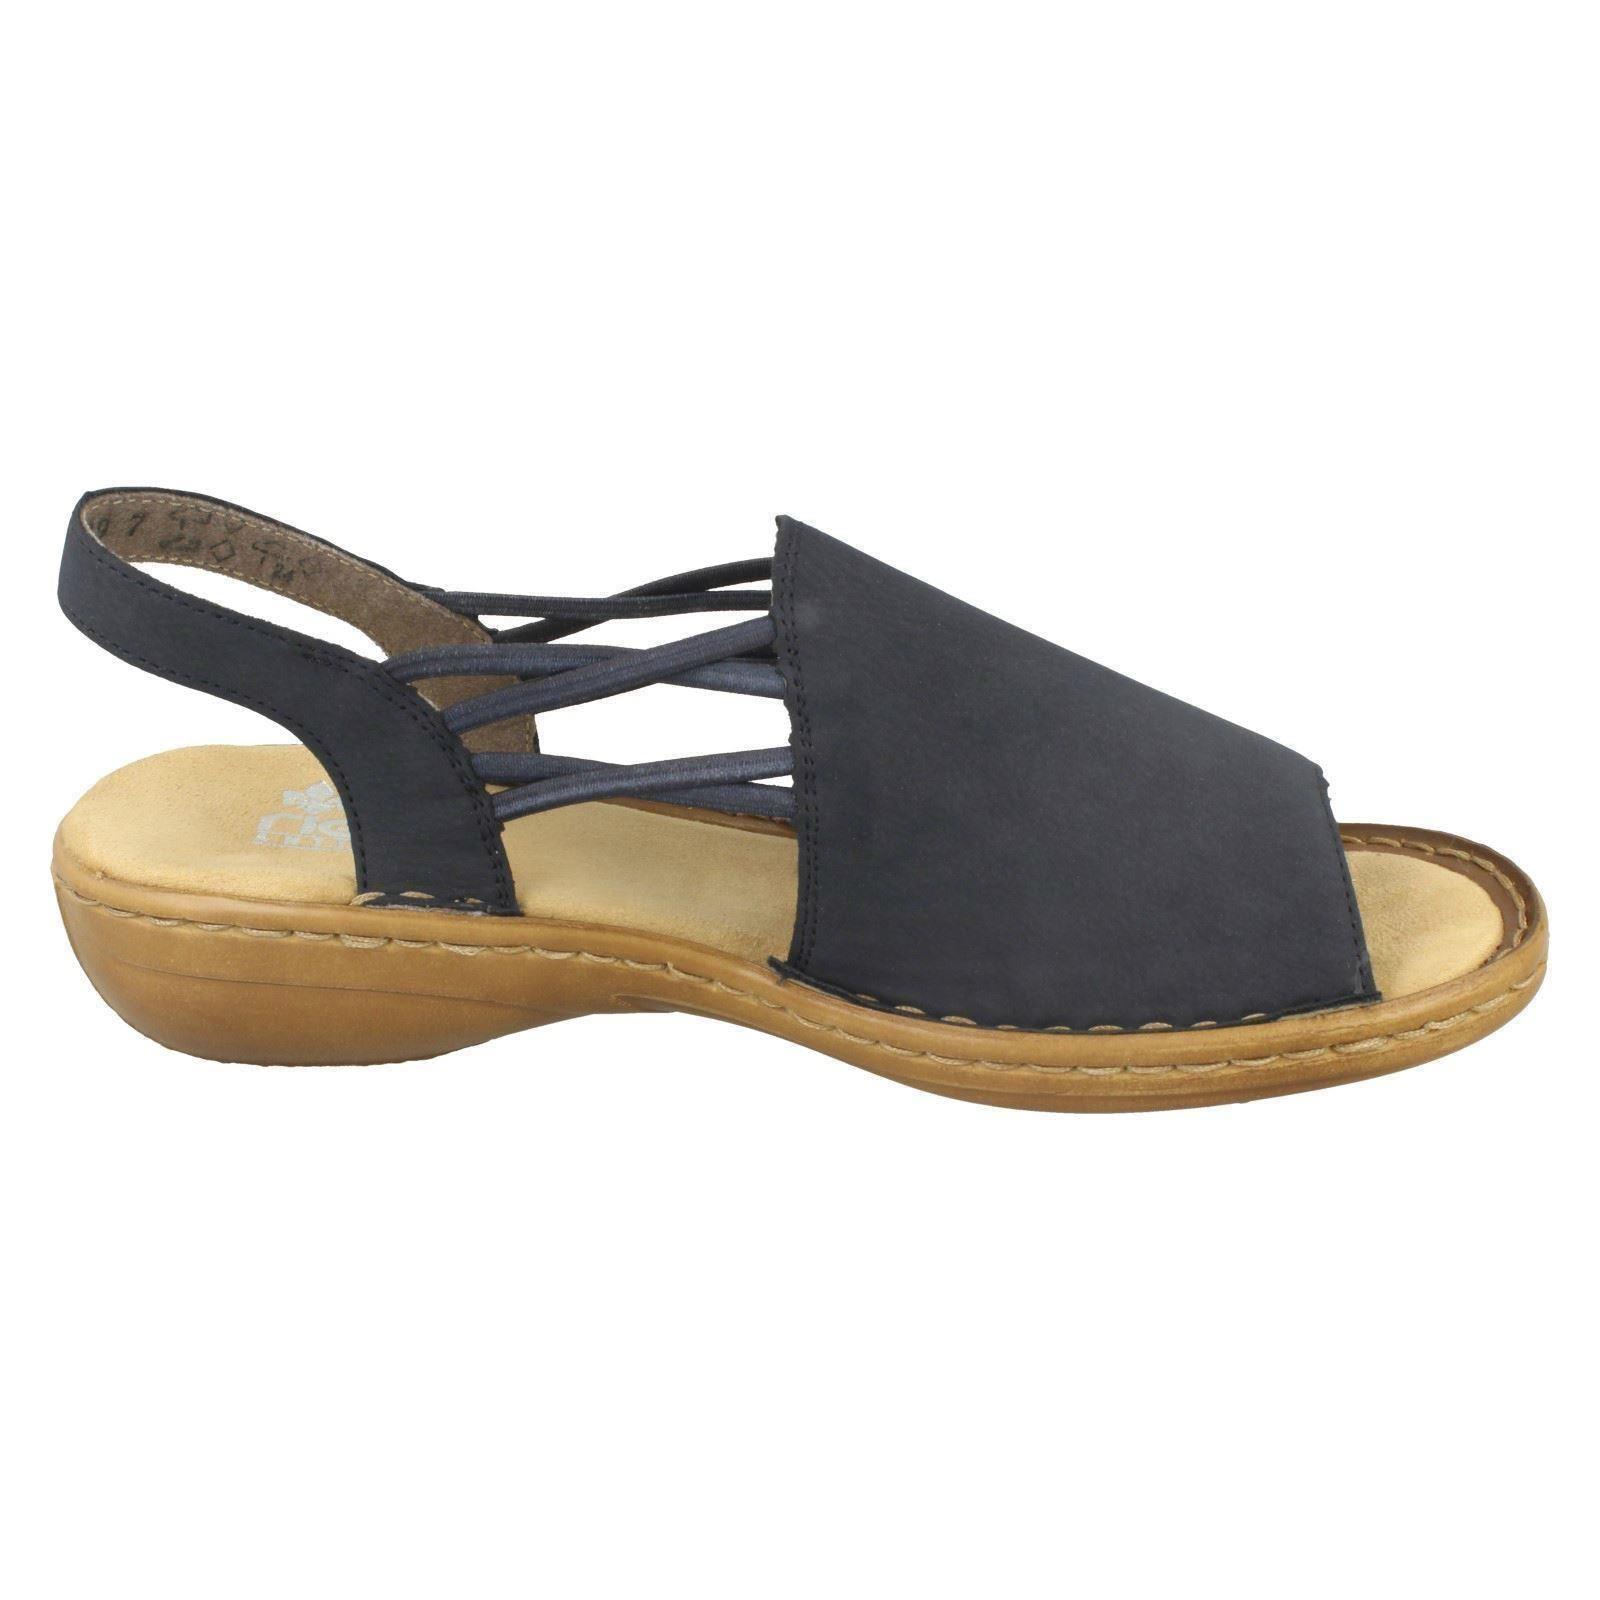 Womens Ladies Flatform Cork Espadrille Sandals Wedge Lace Up Ankle Shoes YAT2